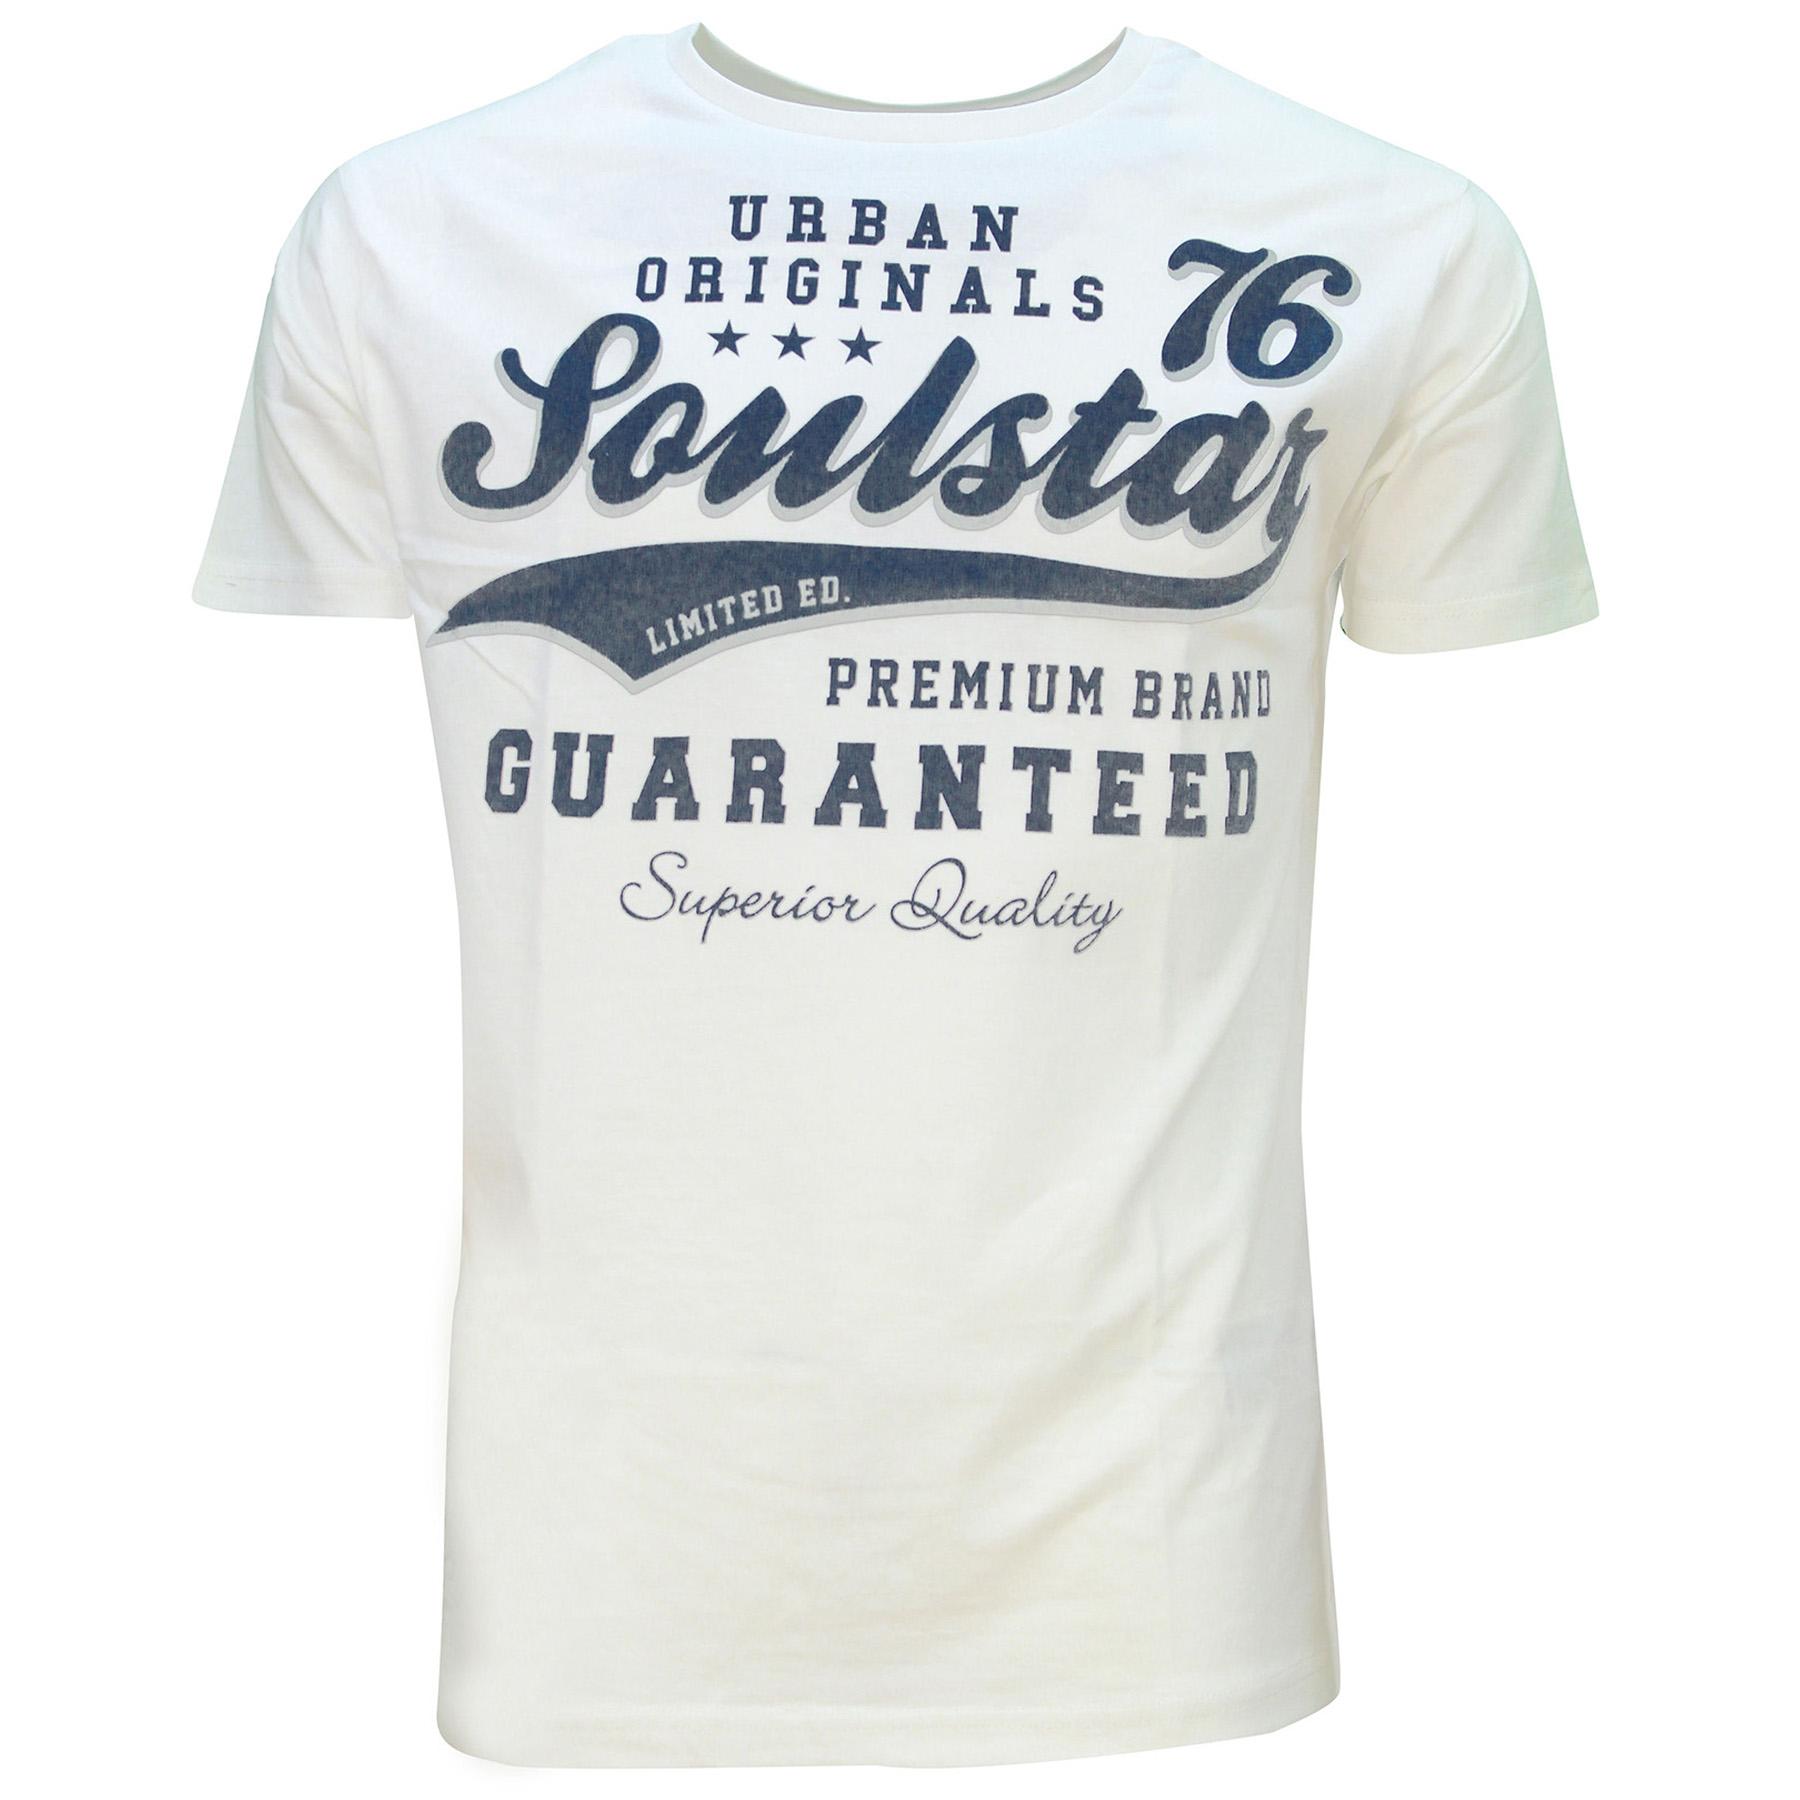 Mens Short Sleeved Urban Originals T Shirts By Soul Star